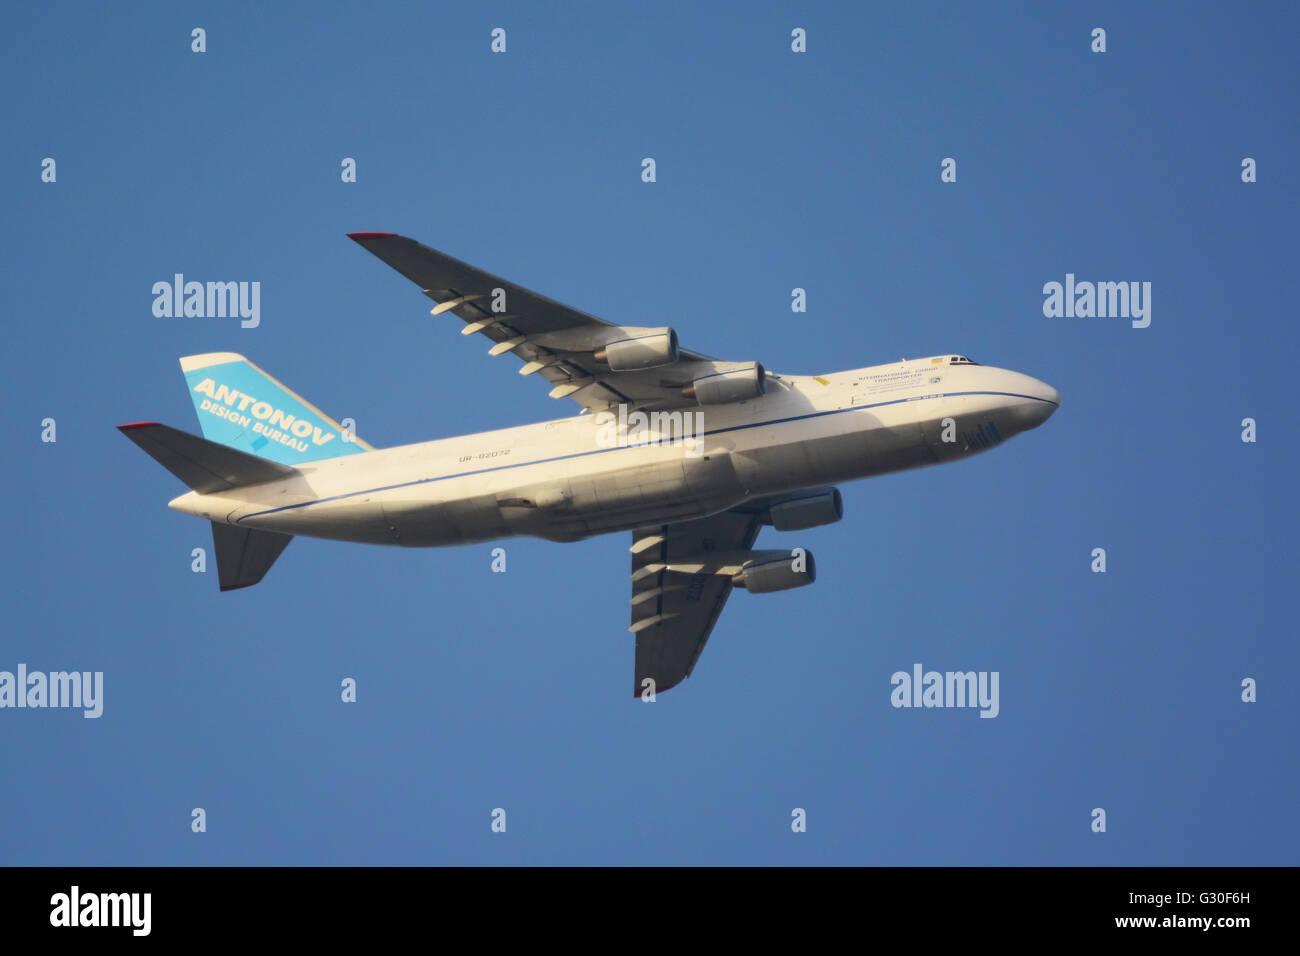 Antonov Cargo airplane in mid air - Stock Image